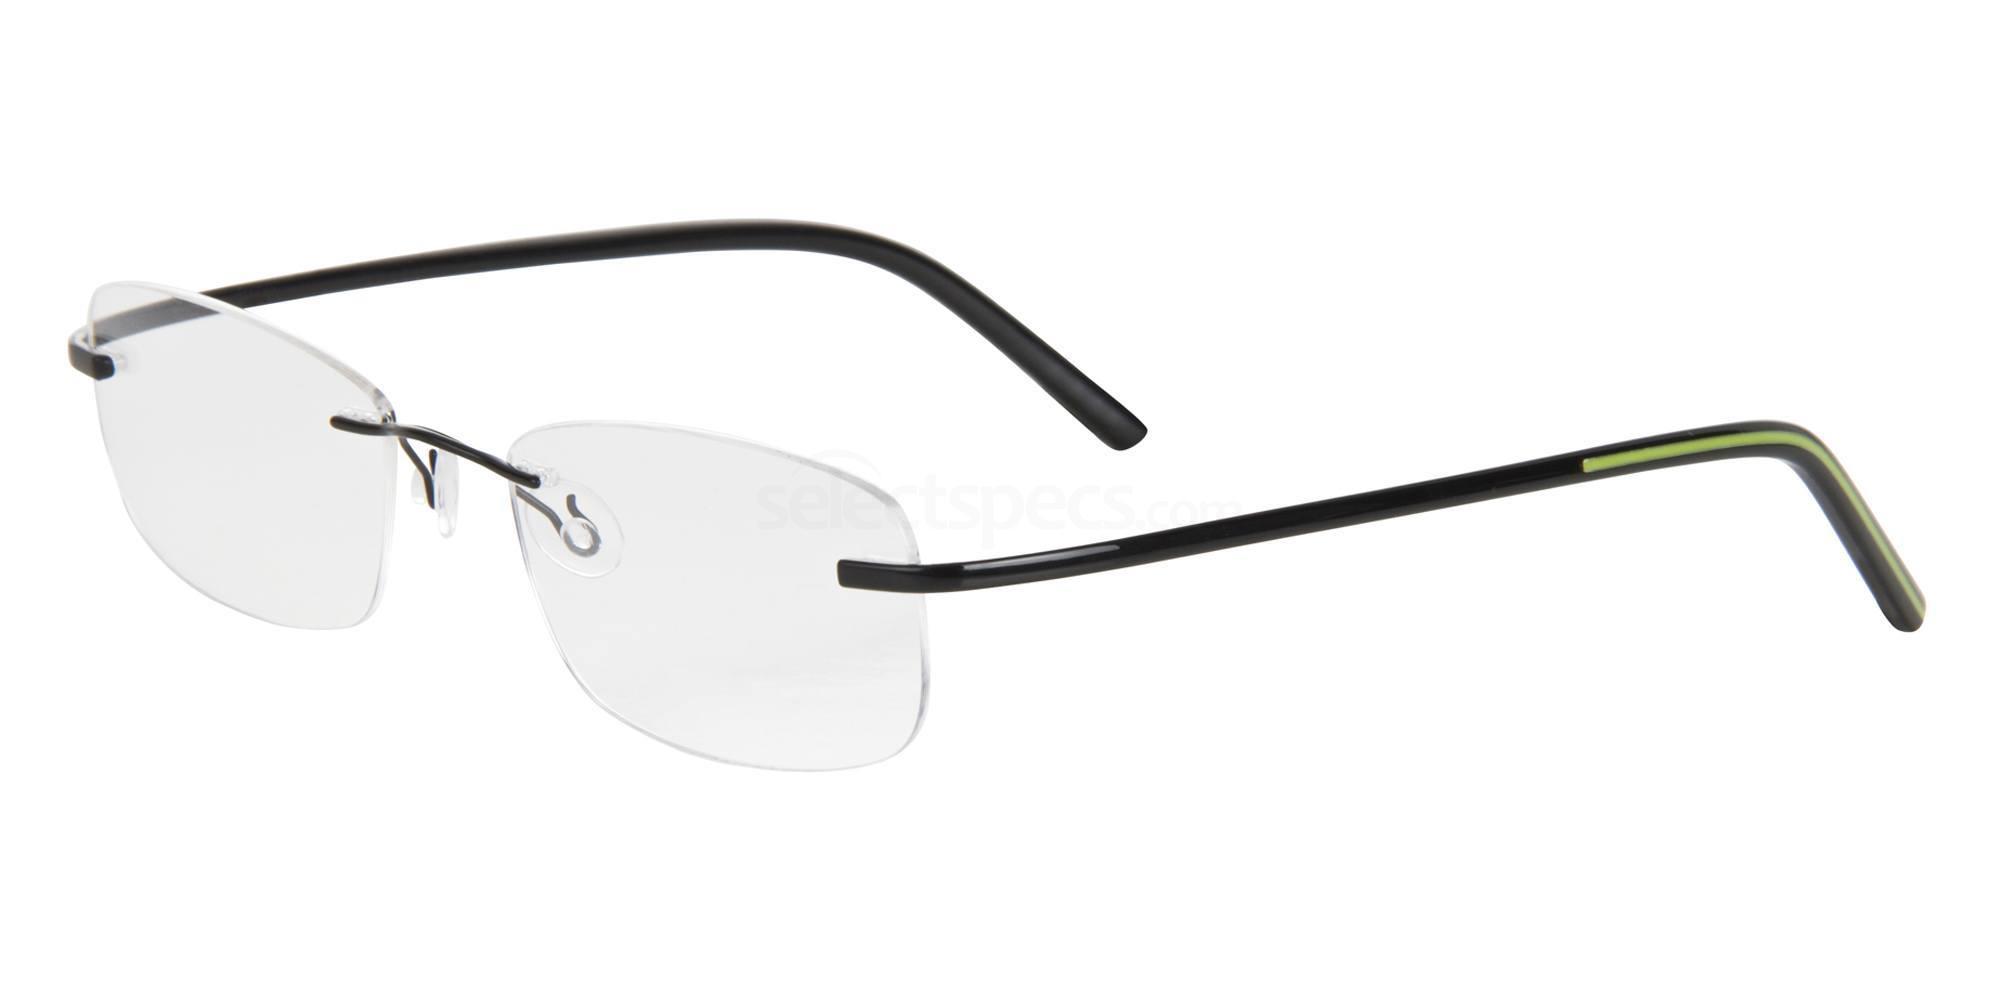 001 ENERGY 202 Glasses, AIRLOCK